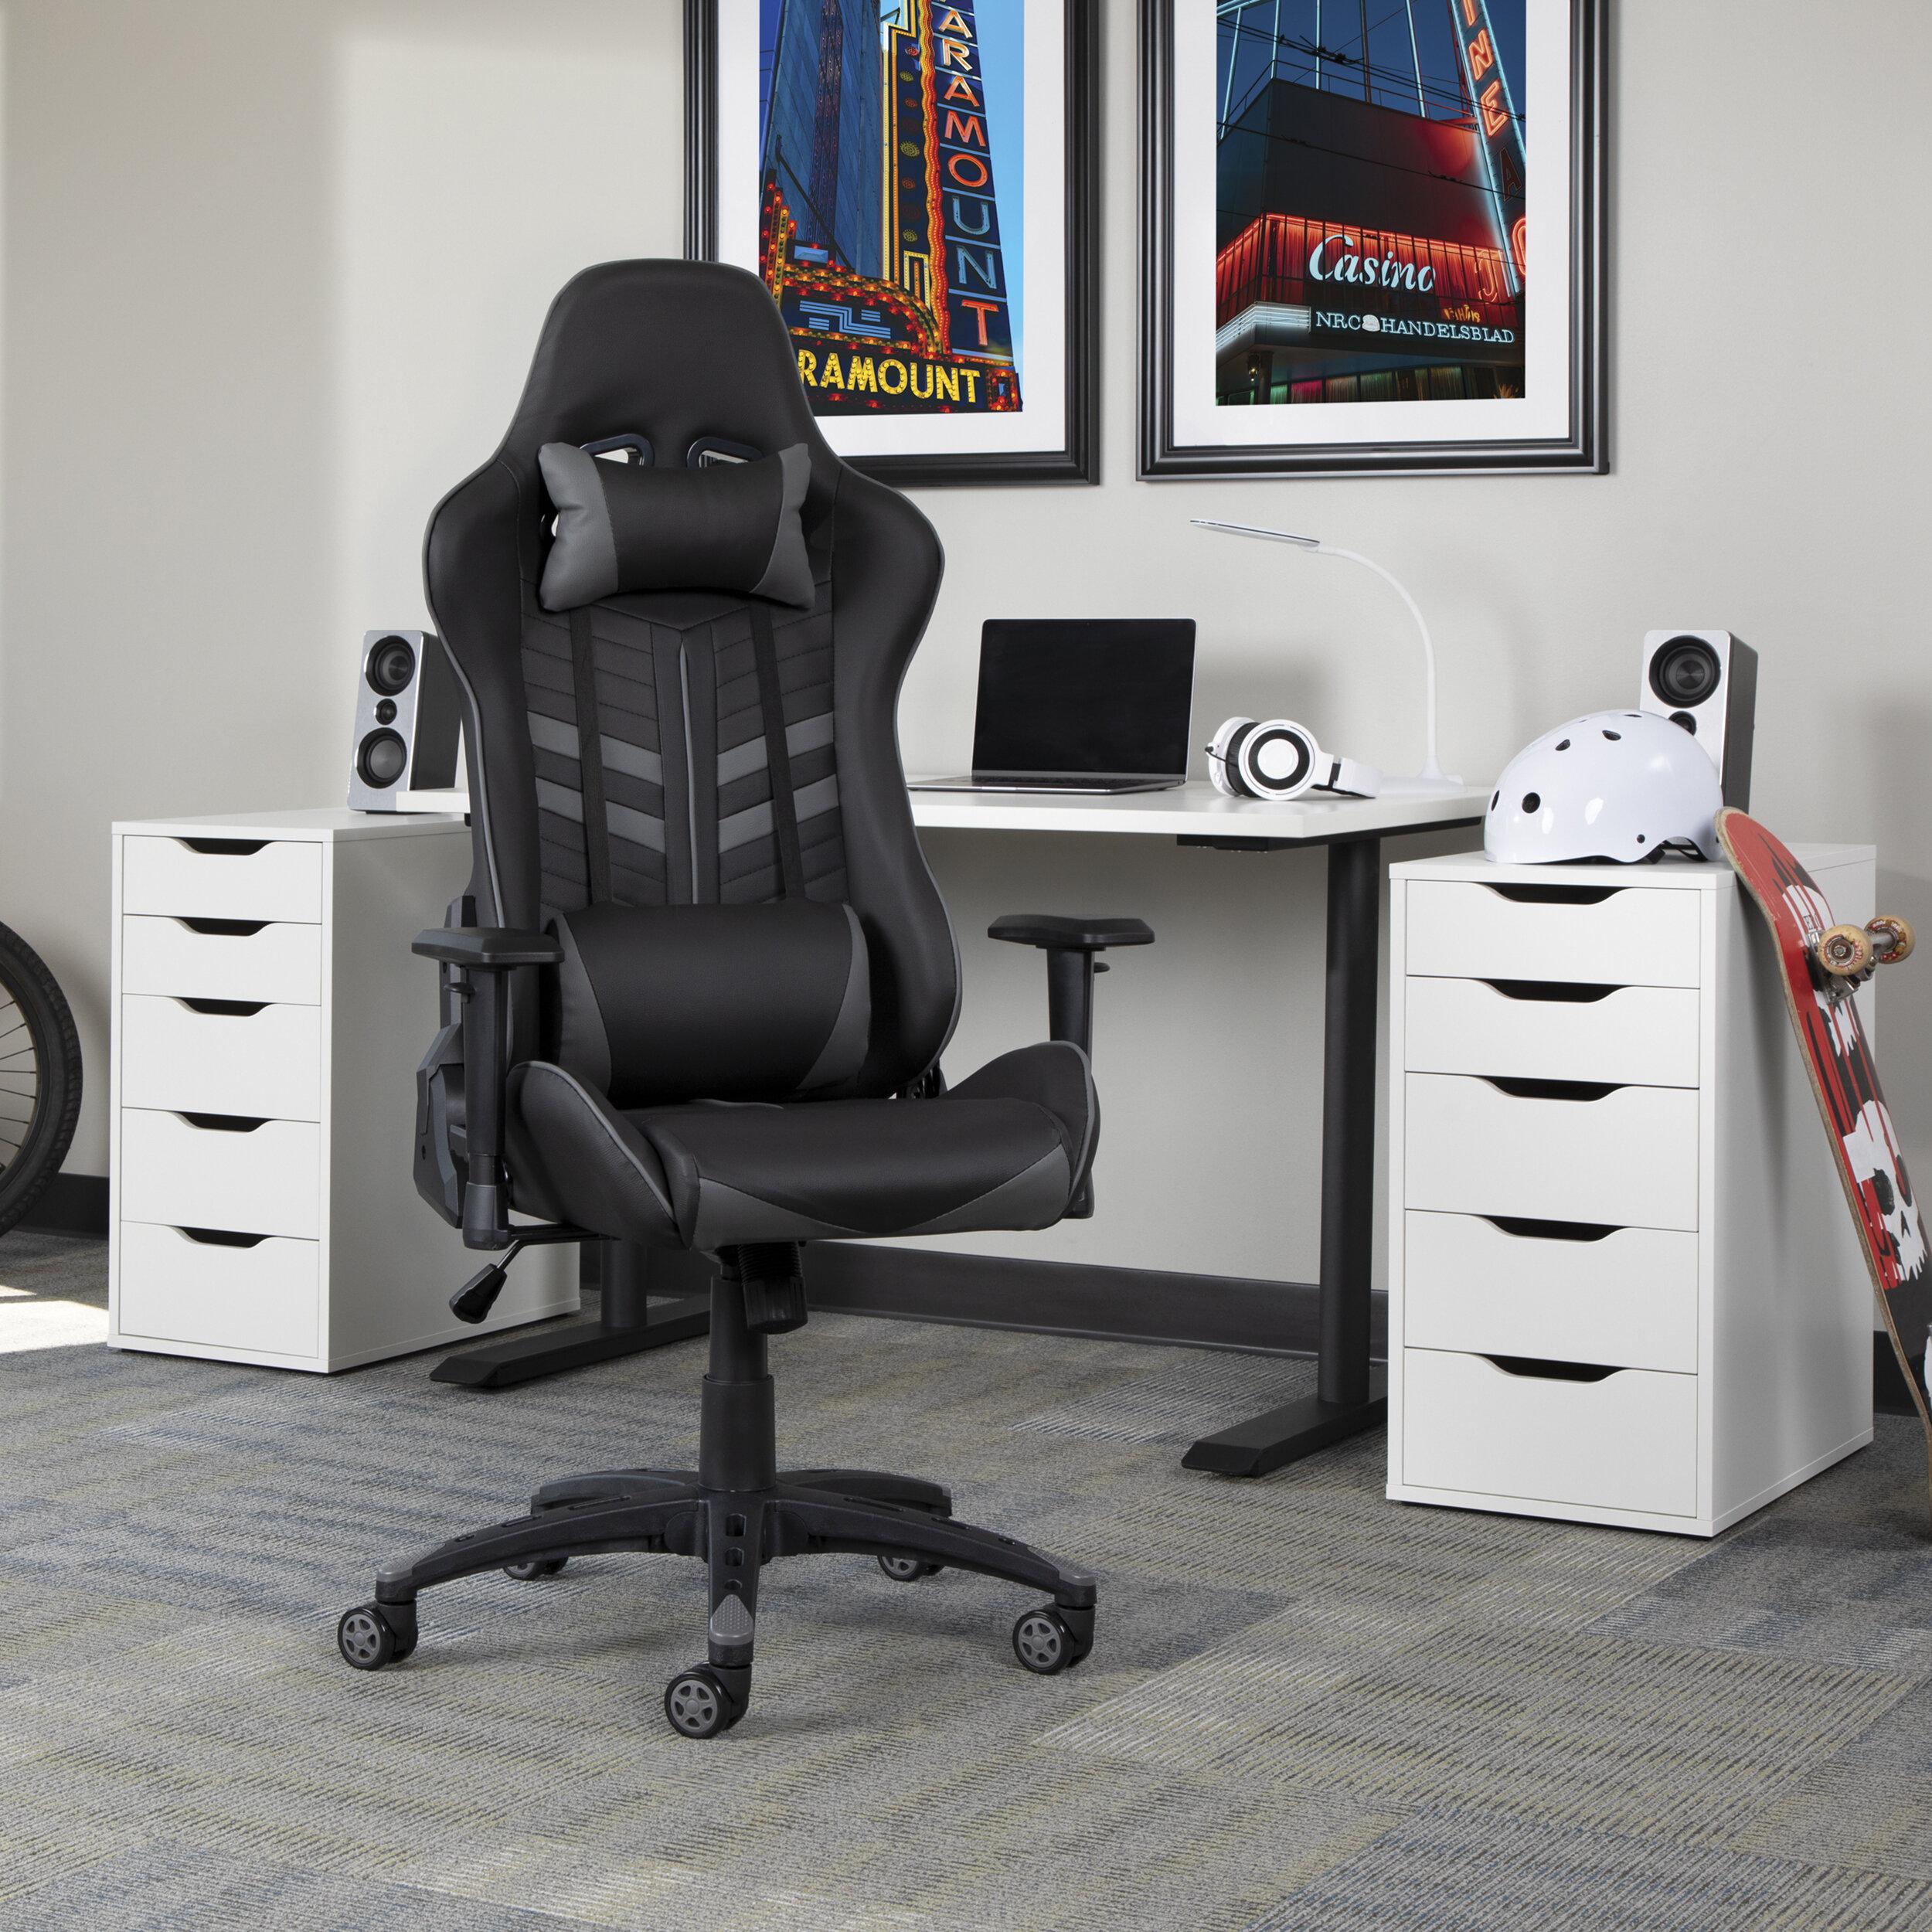 Sensational Jones Street Racing Ergonomic Gaming Chair Ibusinesslaw Wood Chair Design Ideas Ibusinesslaworg